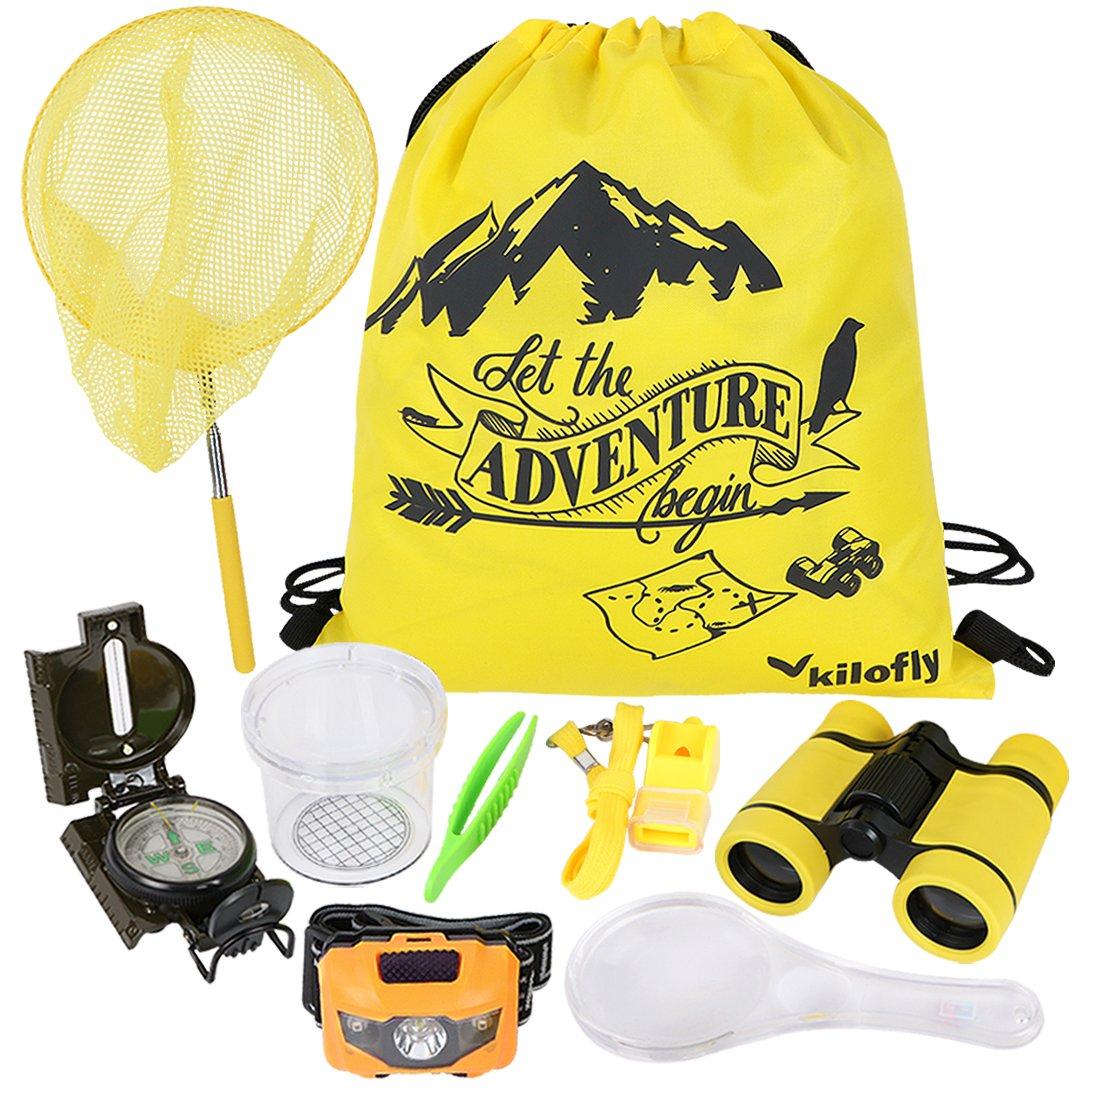 kilofly 9-in-1 Kids Nature Explorer Kit Fun Backyard Bug Catching Adventure Pack by kilofly